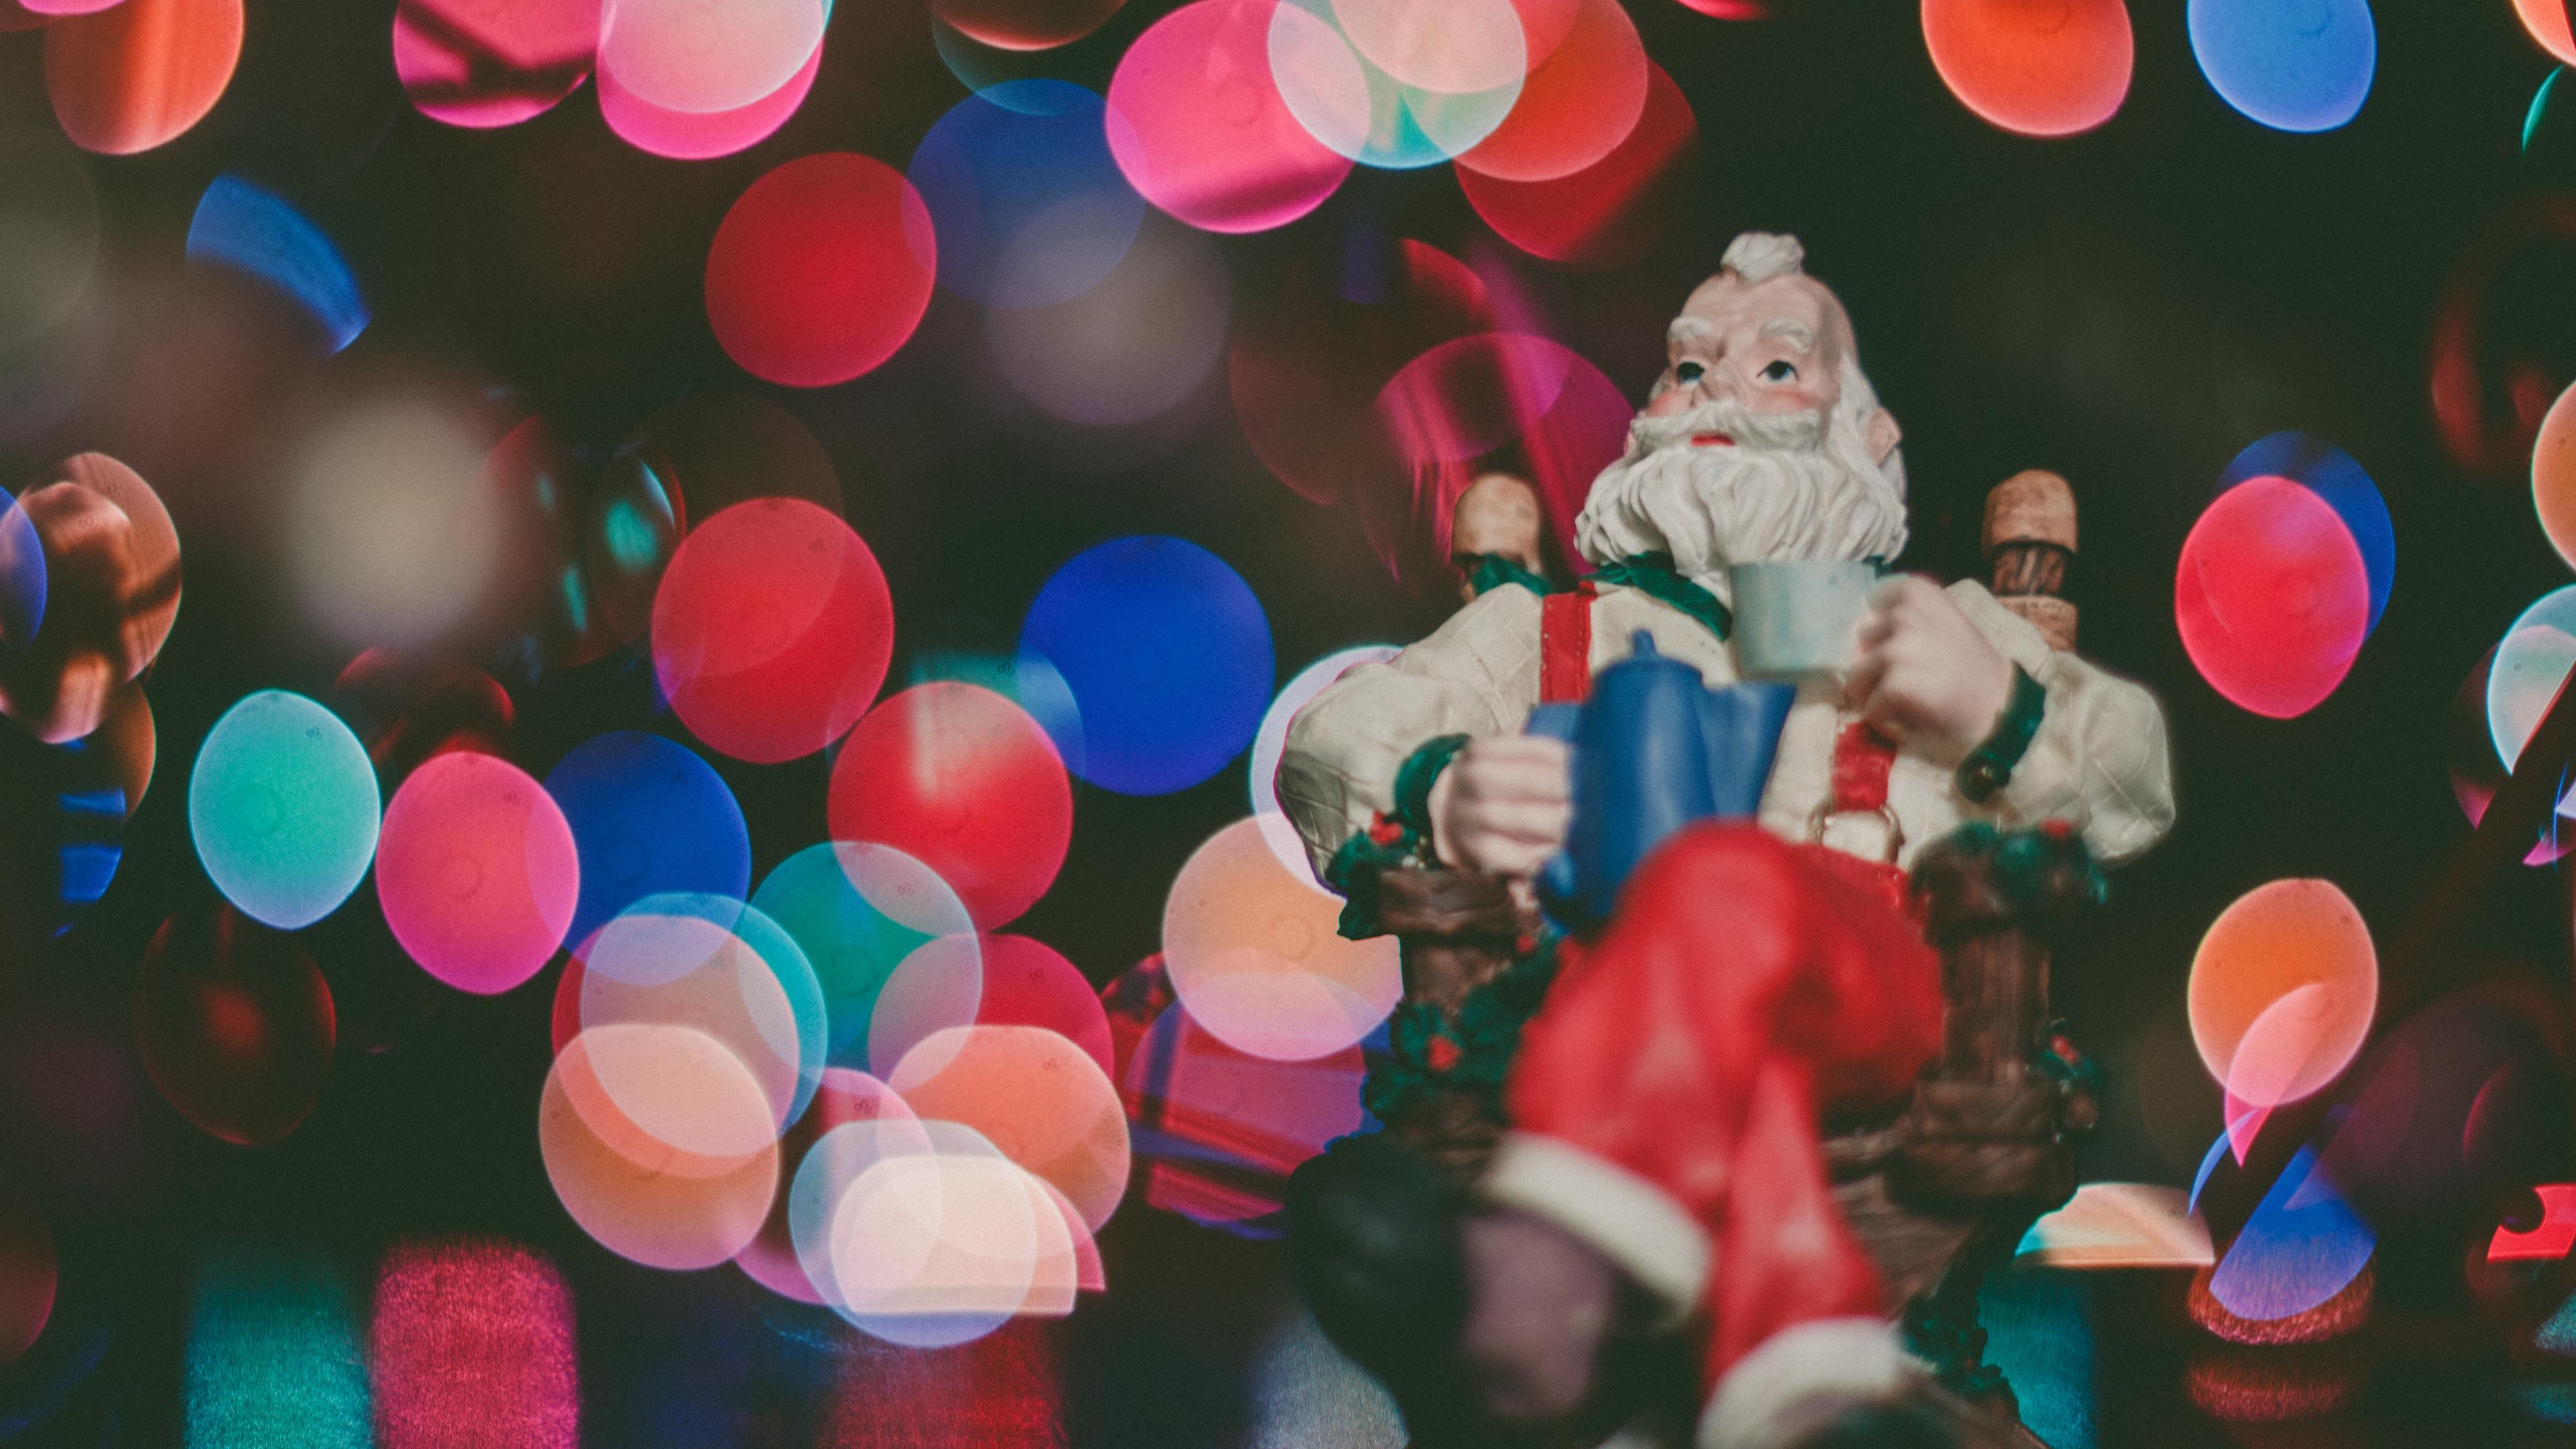 santa claus glare new year 4k 1538344631 - santa claus, glare, new year 4k - santa claus, new year, glare